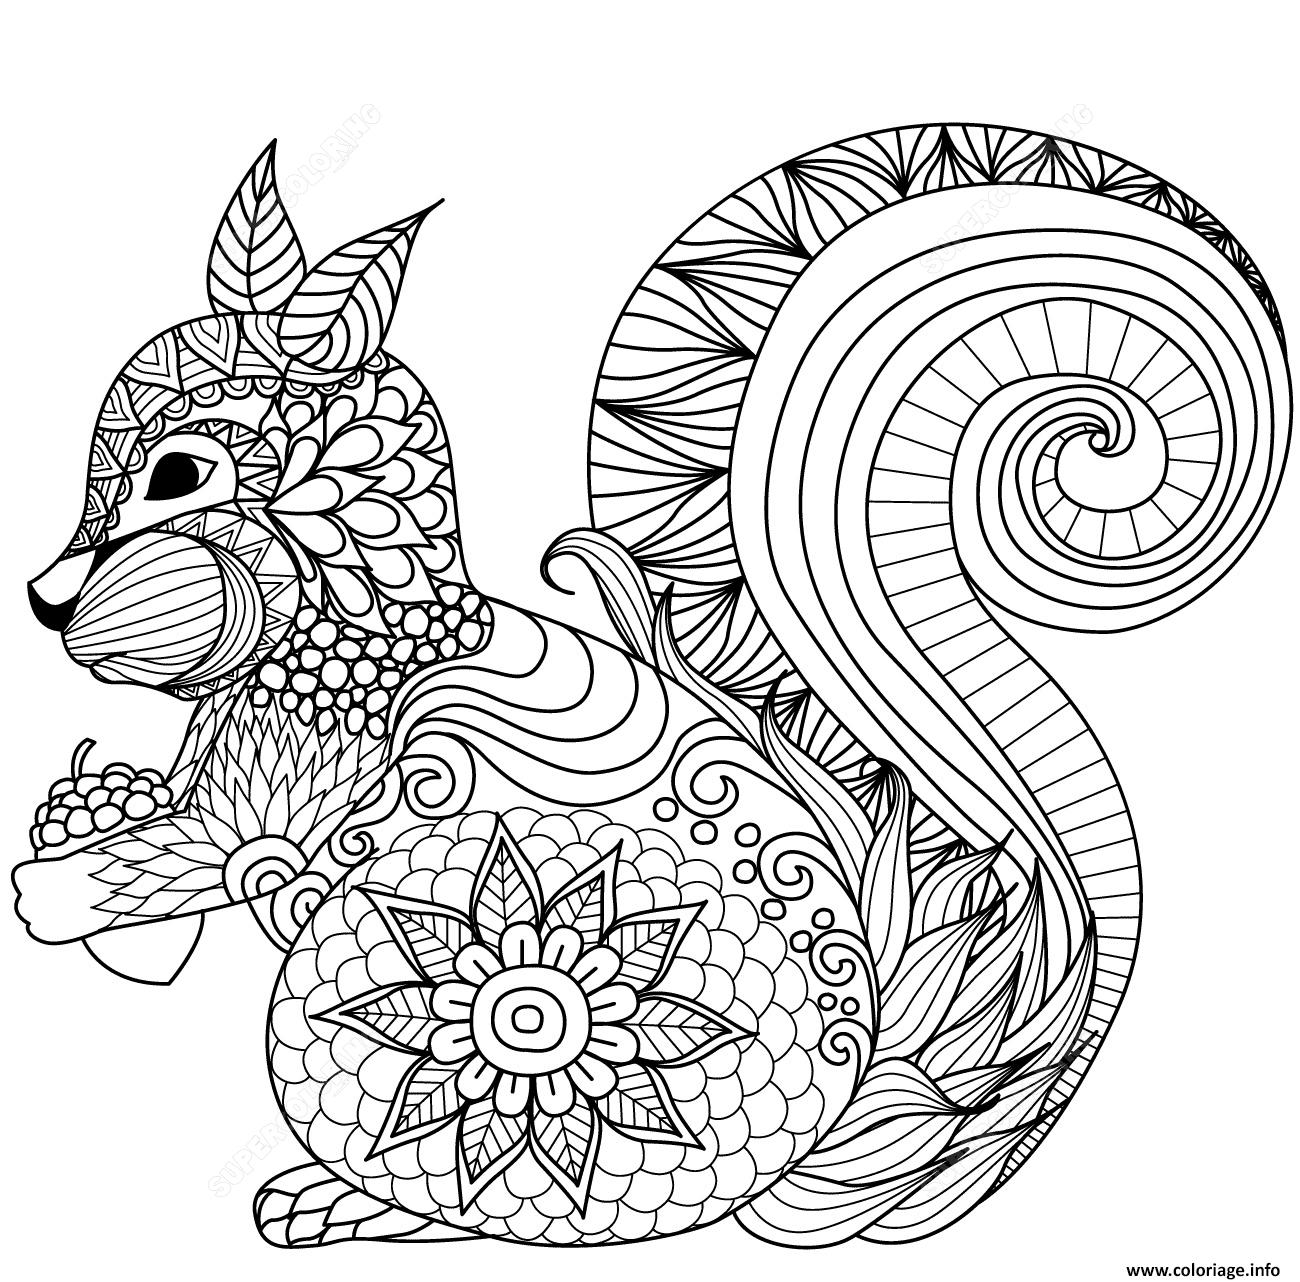 Coloriage Squirrel Zentangle Adulte1 Jecoloriecom